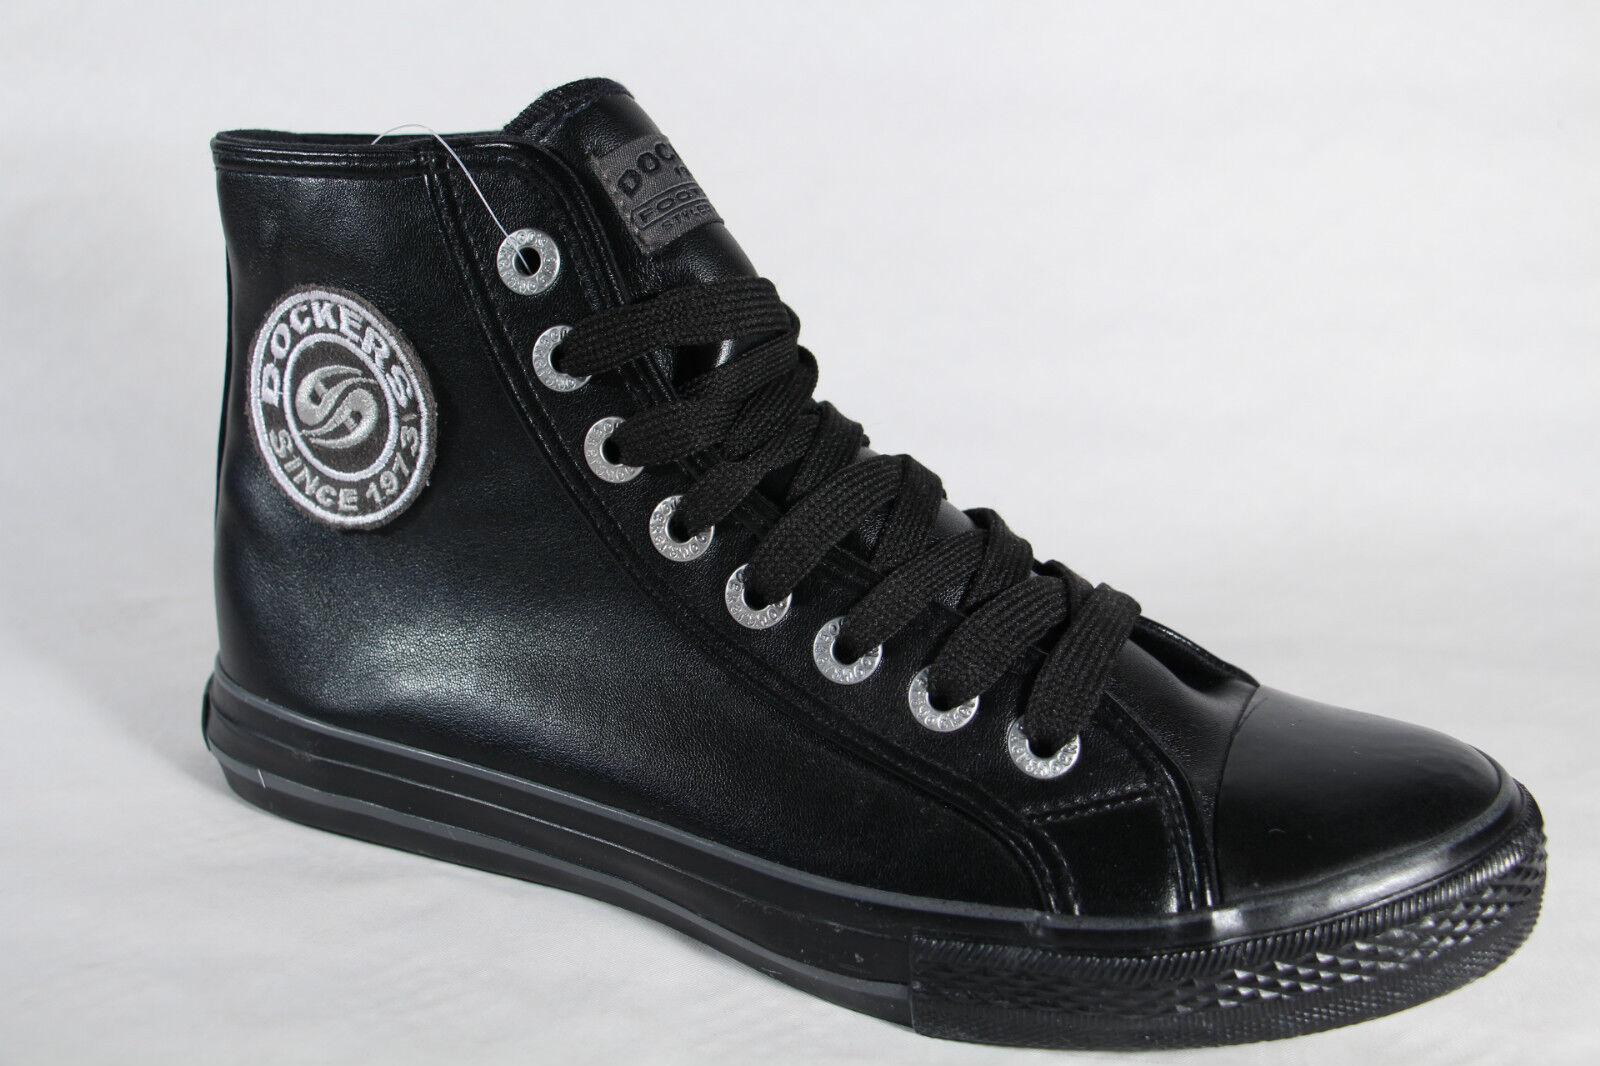 Dockers Stivali, Stivali, nera Scarpa bassa finta pelle nera Stivali, NUOVO ecfb17